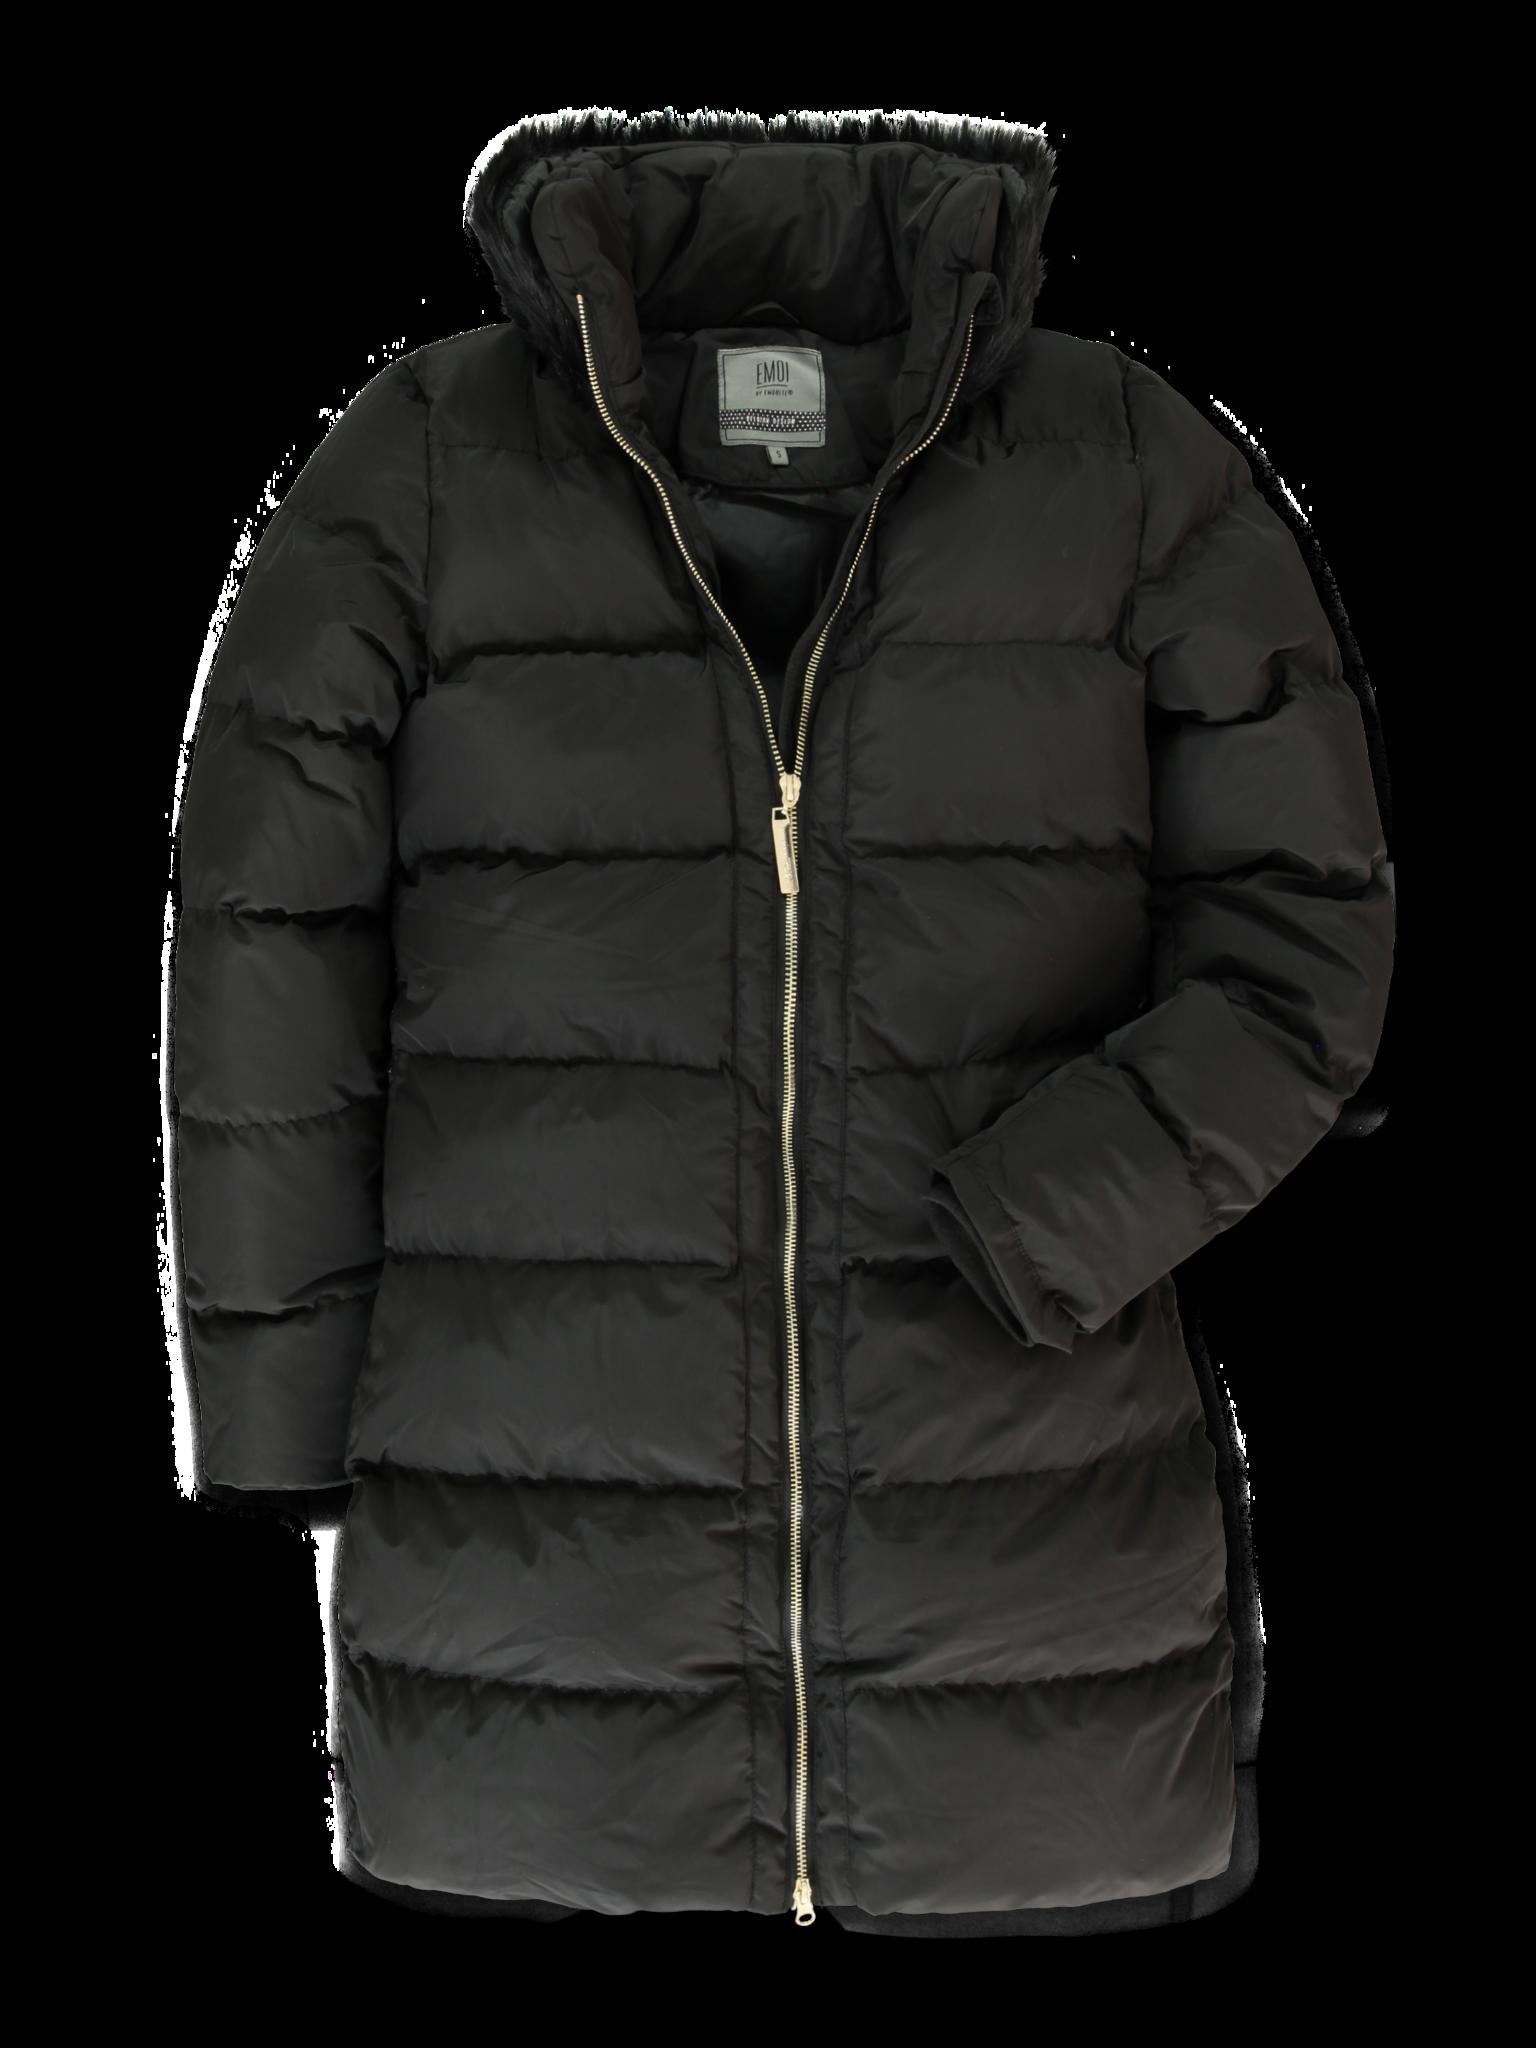 Emoi   Winter 2019 Ladies   Jacket   12 pcs/box